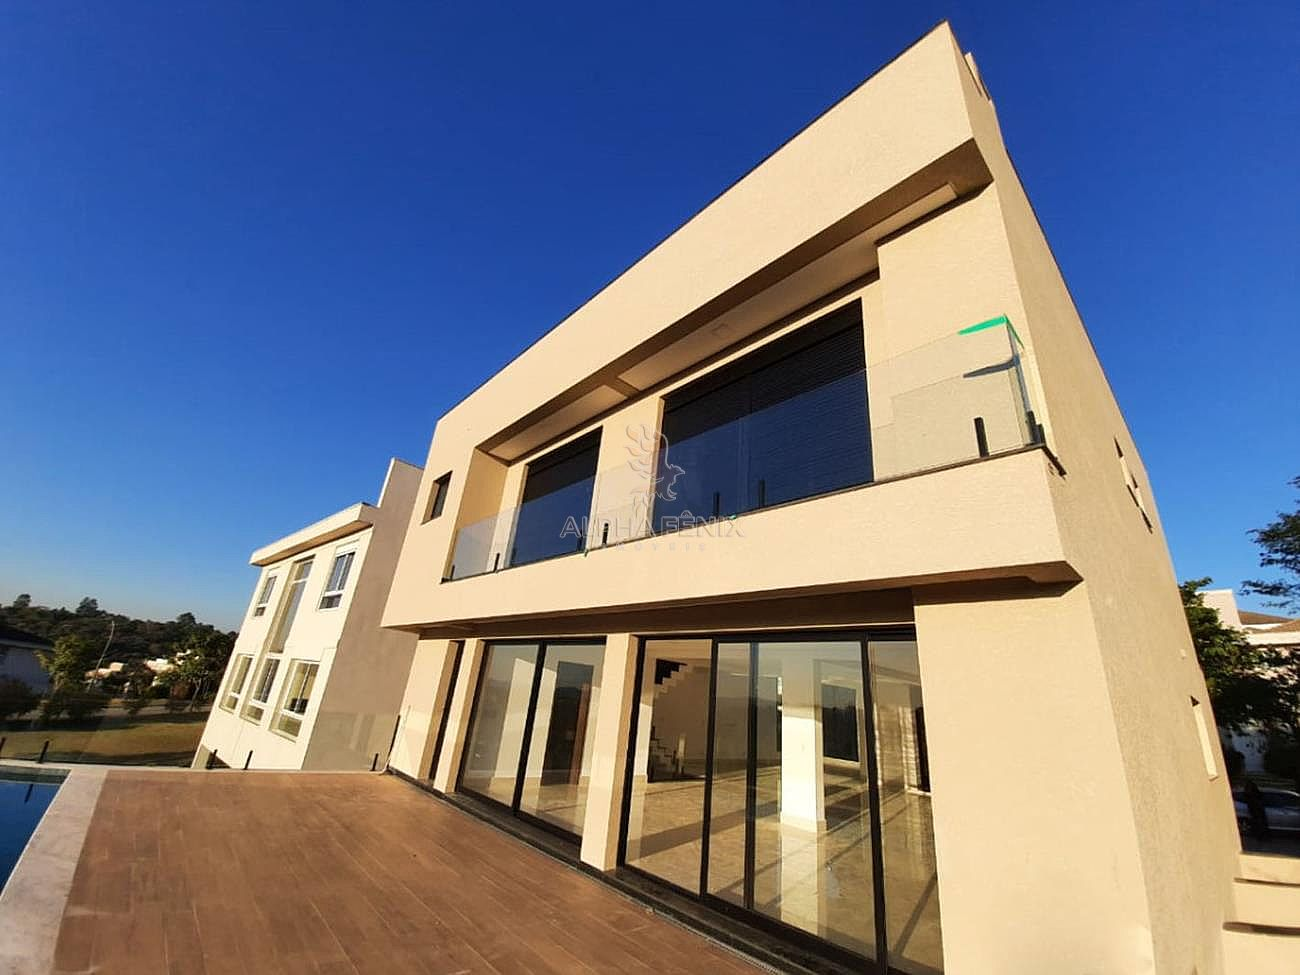 Casa de condomínio para Venda - ALPHAVILLE GENESIS 1 - ALPHAVILLE/SP - Gênesis 1